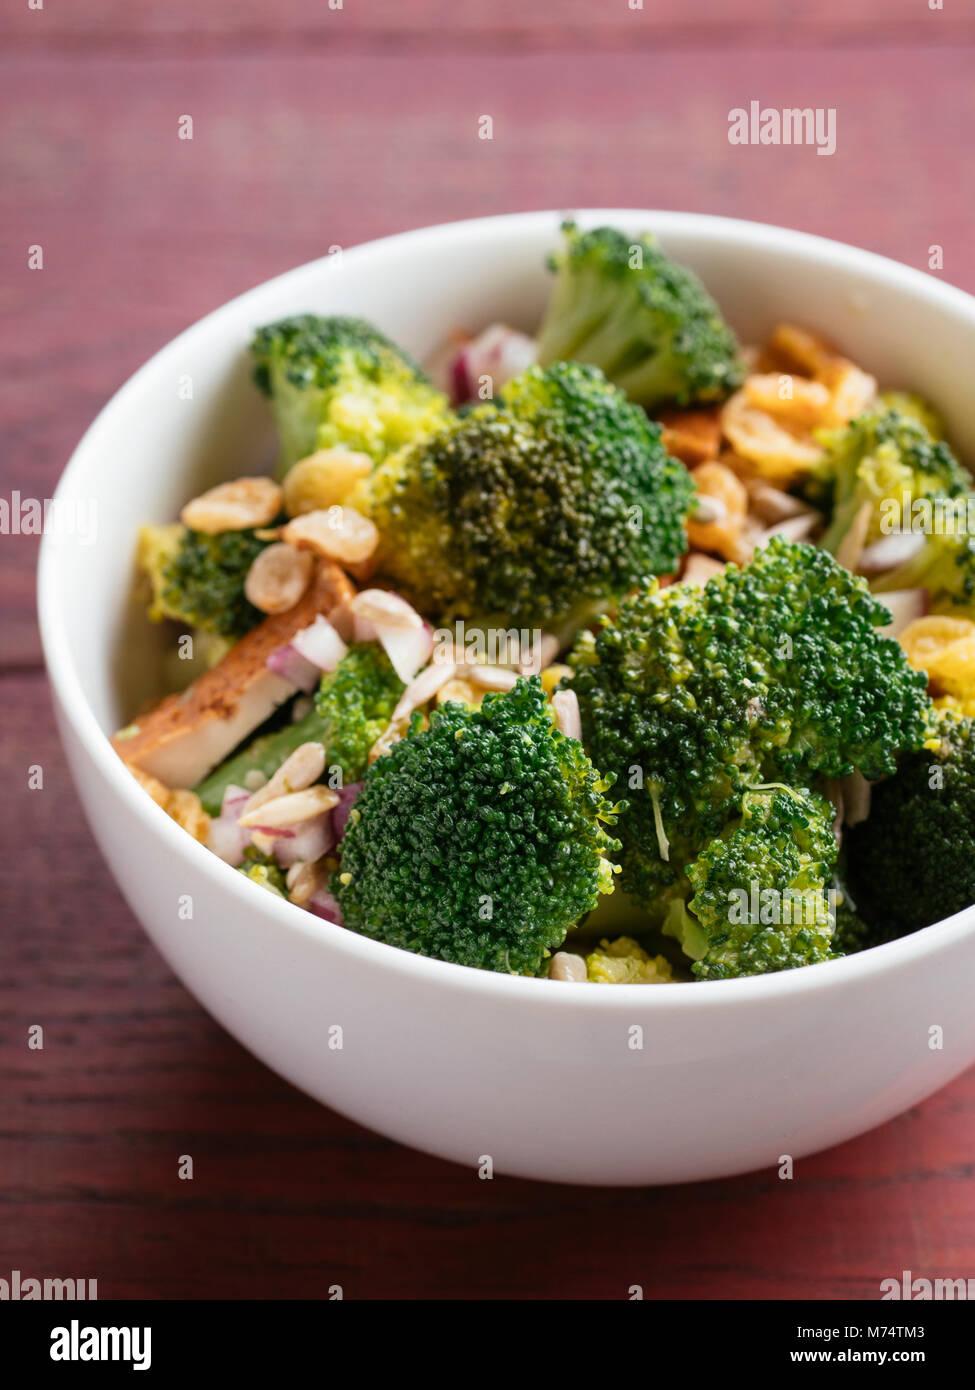 Vegan Broccoli Salad with broccoli, red onion, golden raisins, smoked tofu and sunflower seeds. Stock Photo